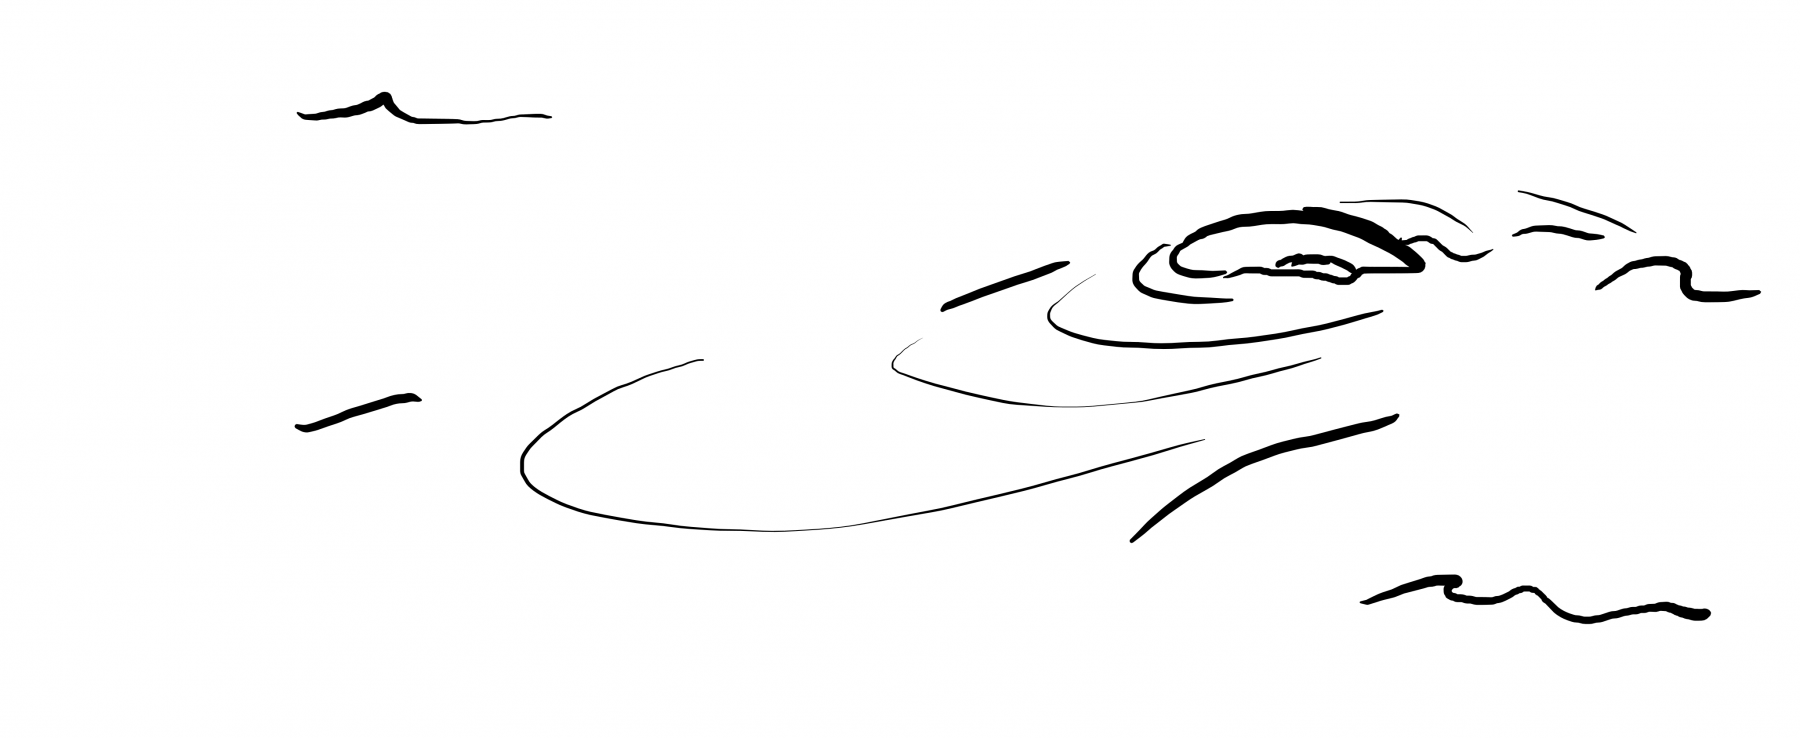 Nut-Thumbnail-Rough-Board003481